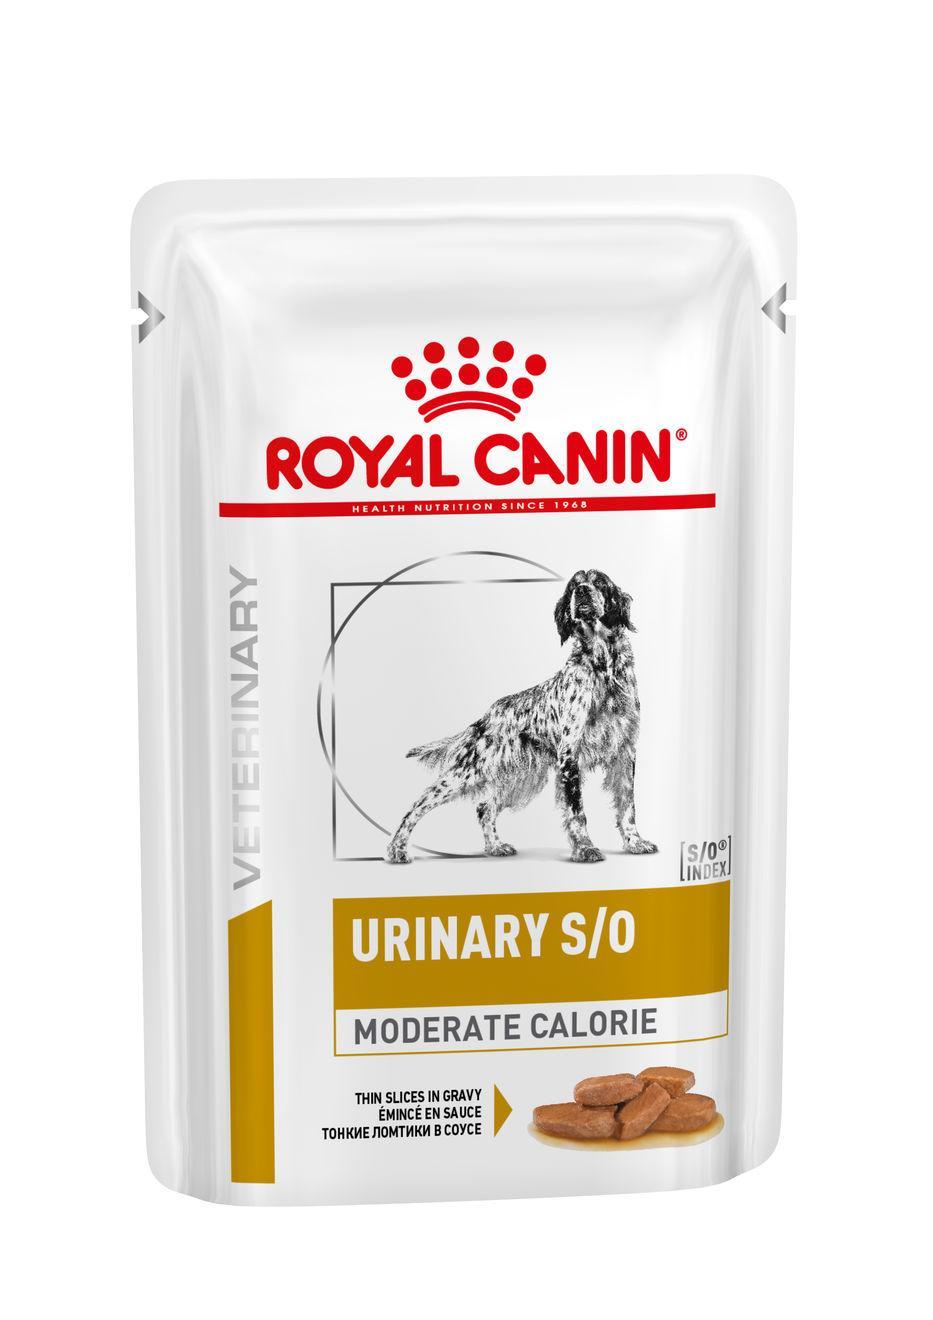 Royal canin veterinary health nutrition dog urinary s/o mc pouch kapsa 100g